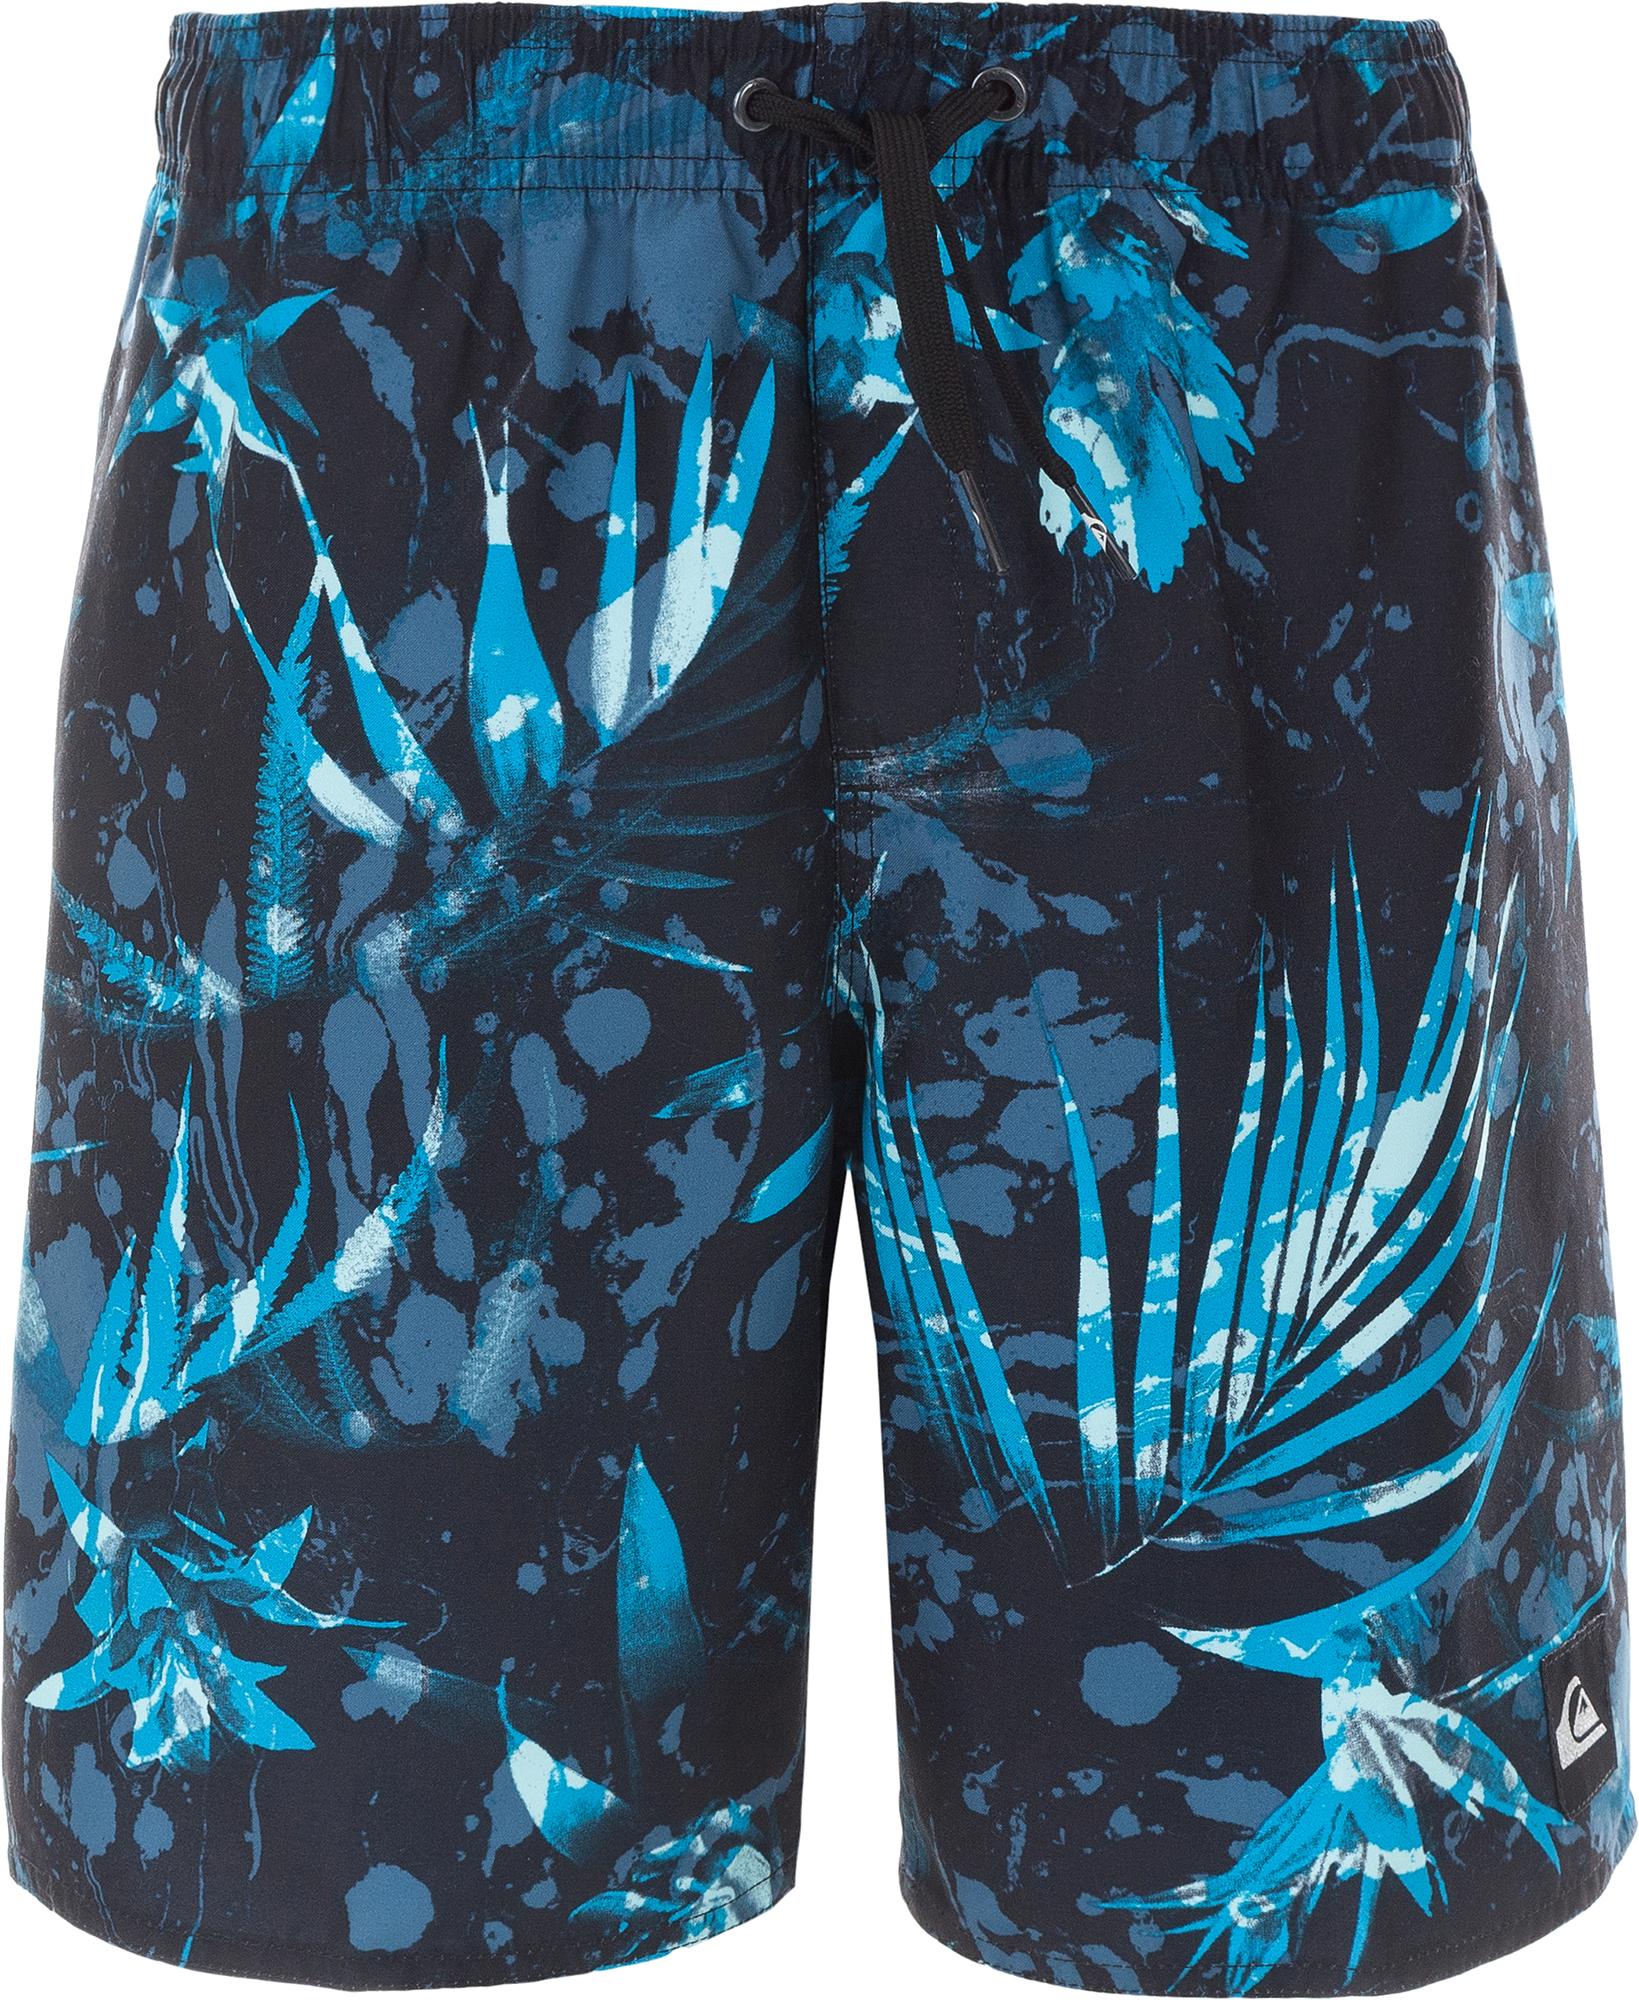 Quiksilver Шорты плавательные для мальчиков Quiksilver Deksey, размер 146-152 quiksilver футболка для мальчиков quiksilver ss classic puke katuna размер 134 140